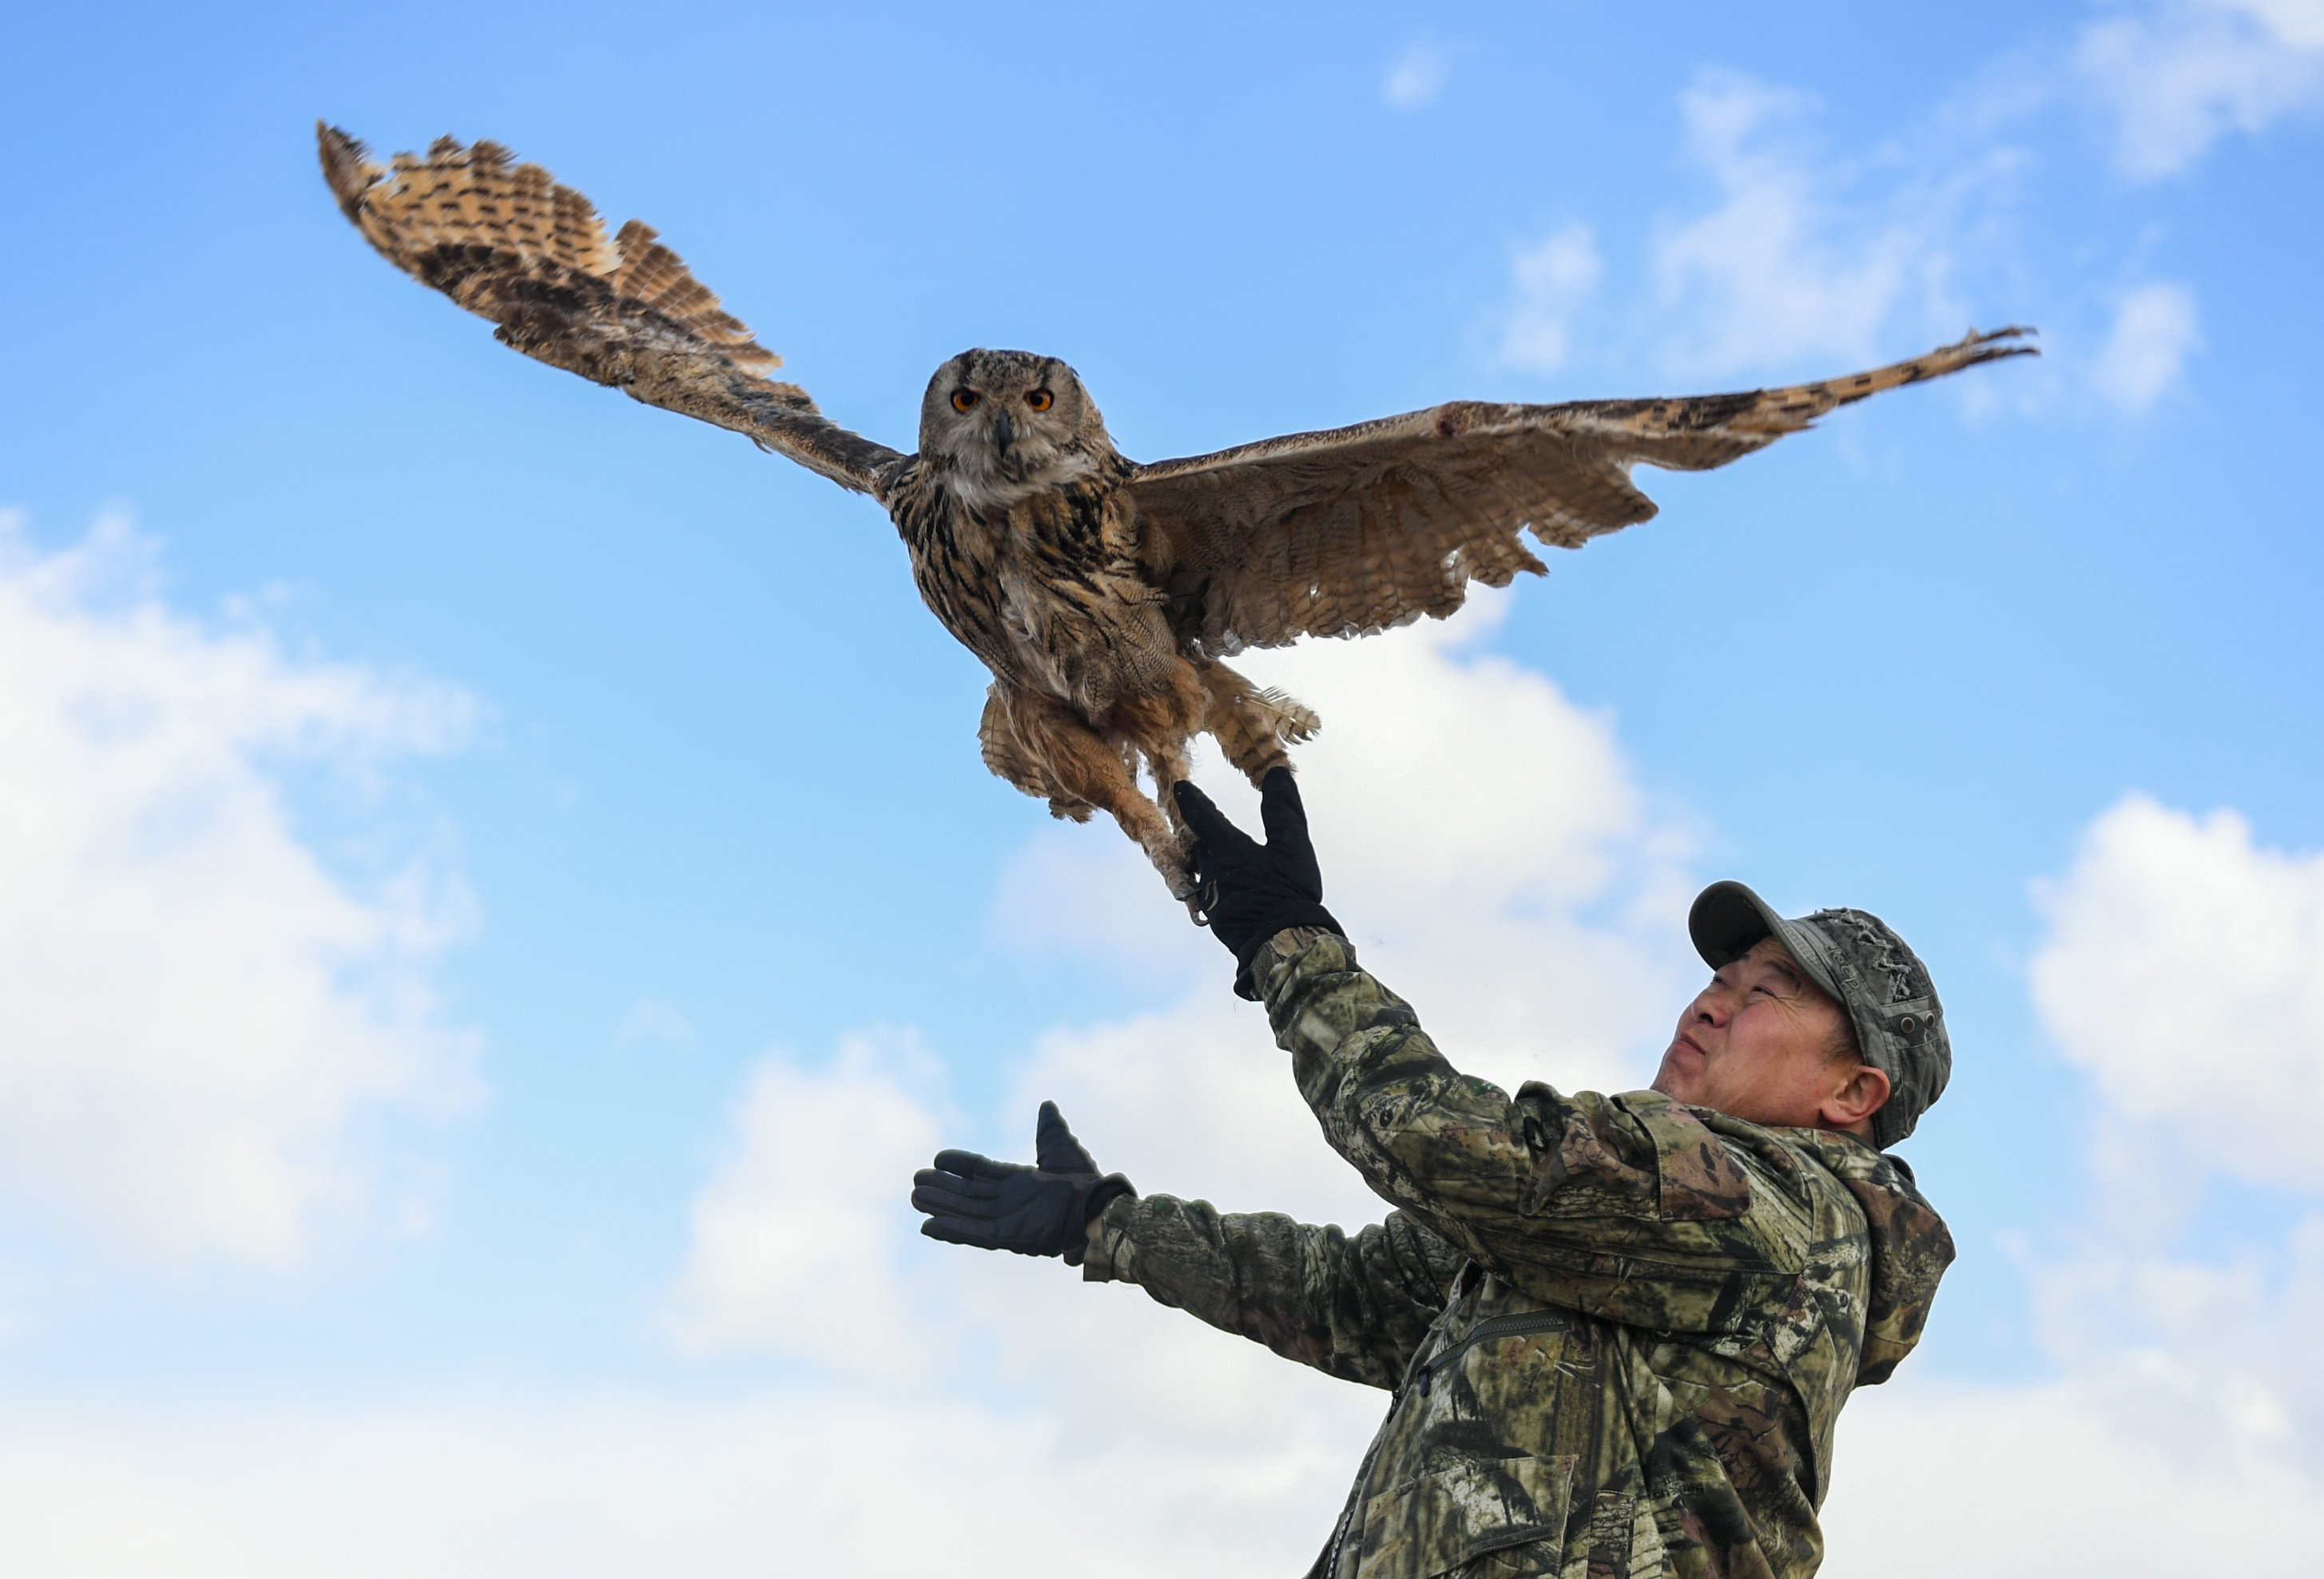 Liberan 53 aves silvestres rehabilitadas en su hábitat natural en China